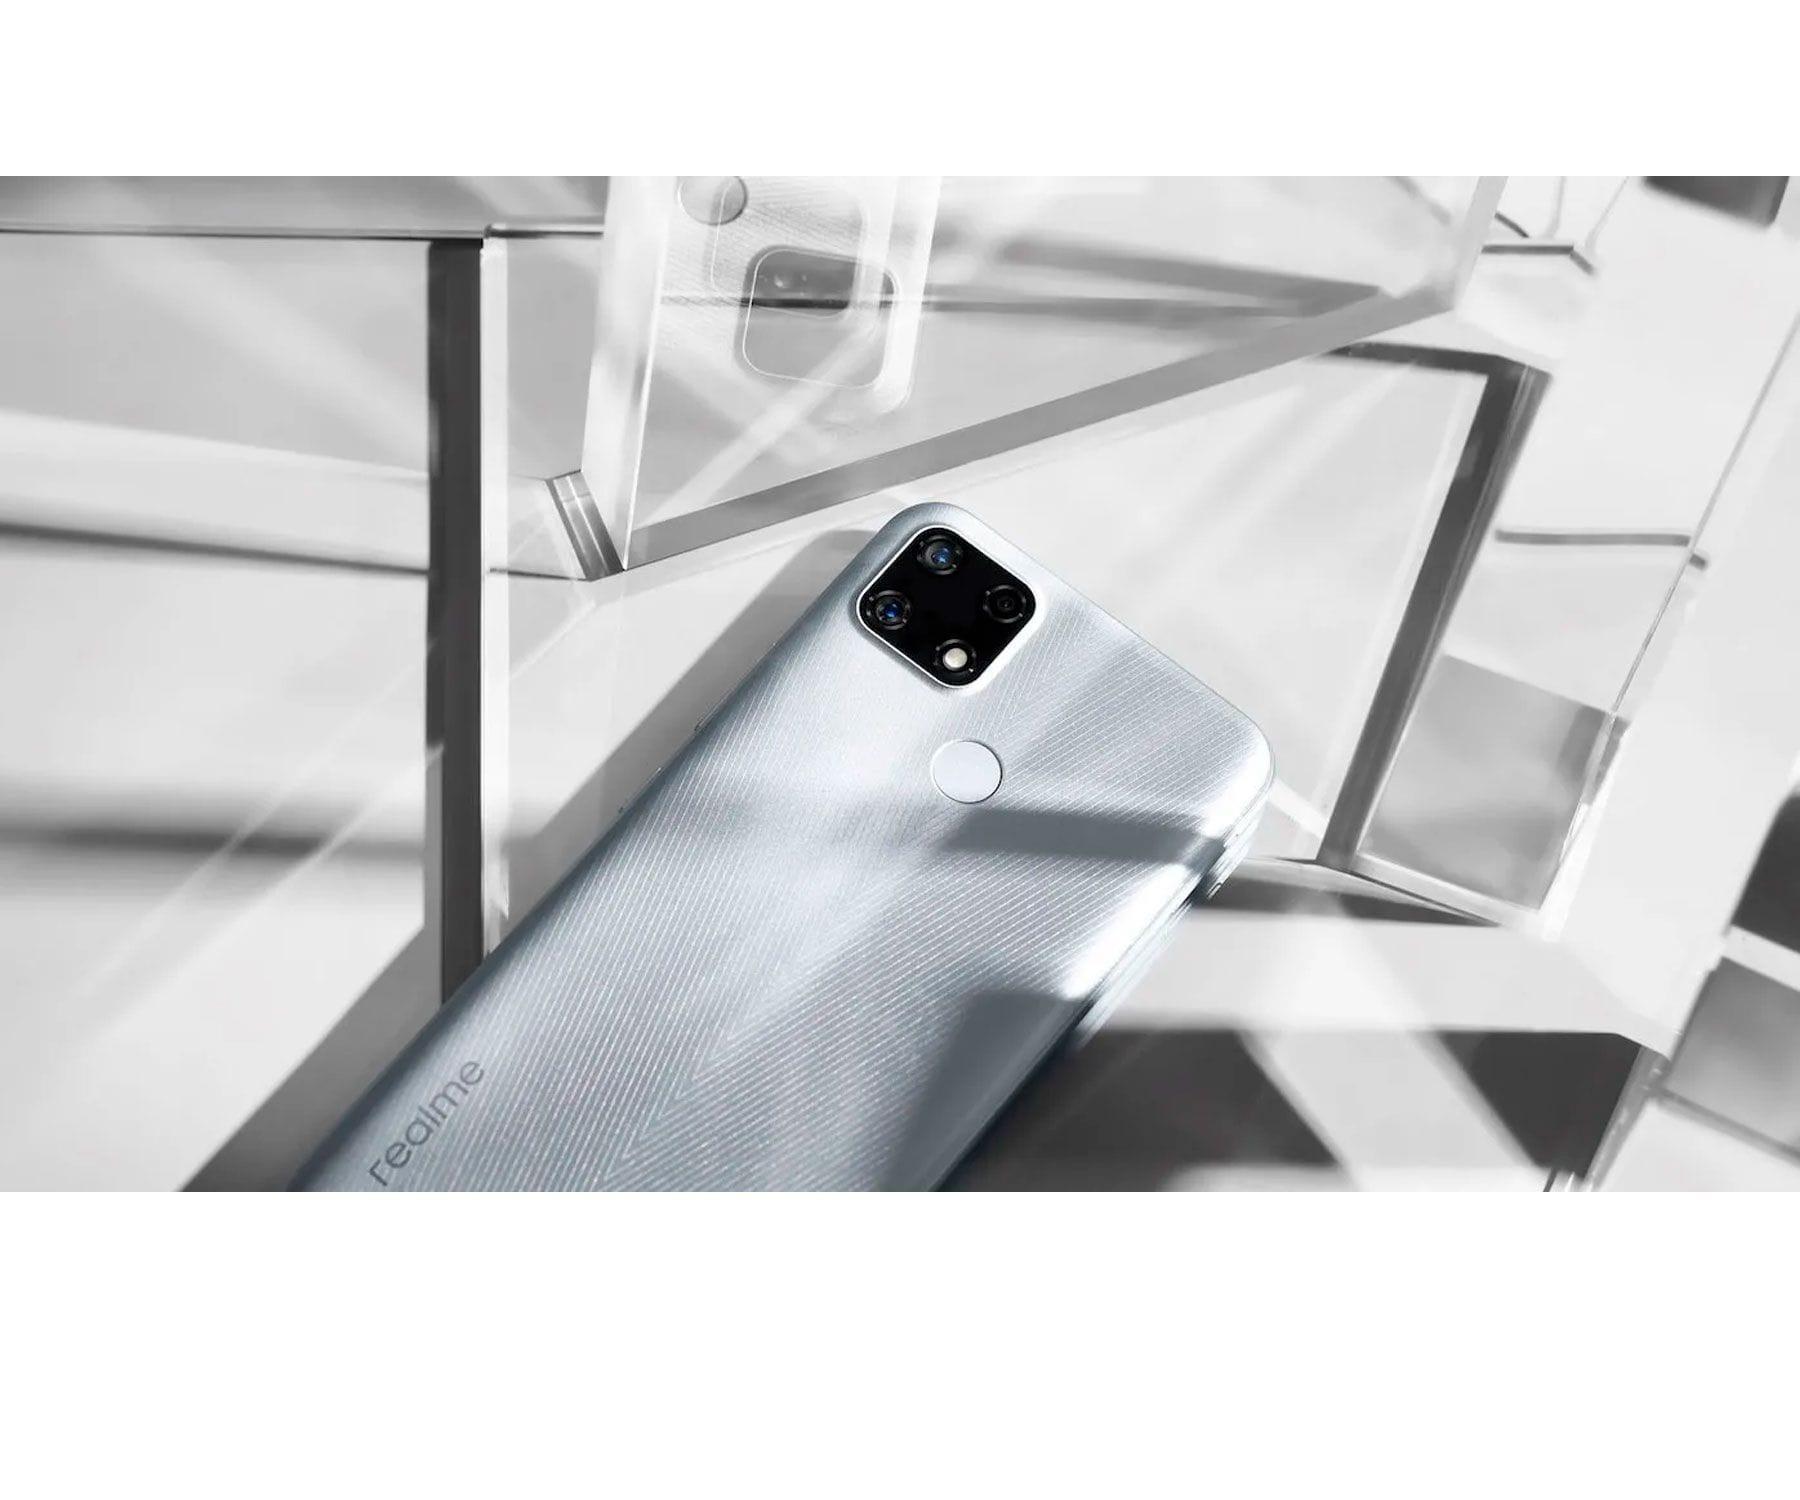 Realme 7i Plata 4g Expansión Por Sd 6.5'' Lcd Fhd+ Octacore 64gb 4gb Ram Triplec... (5)